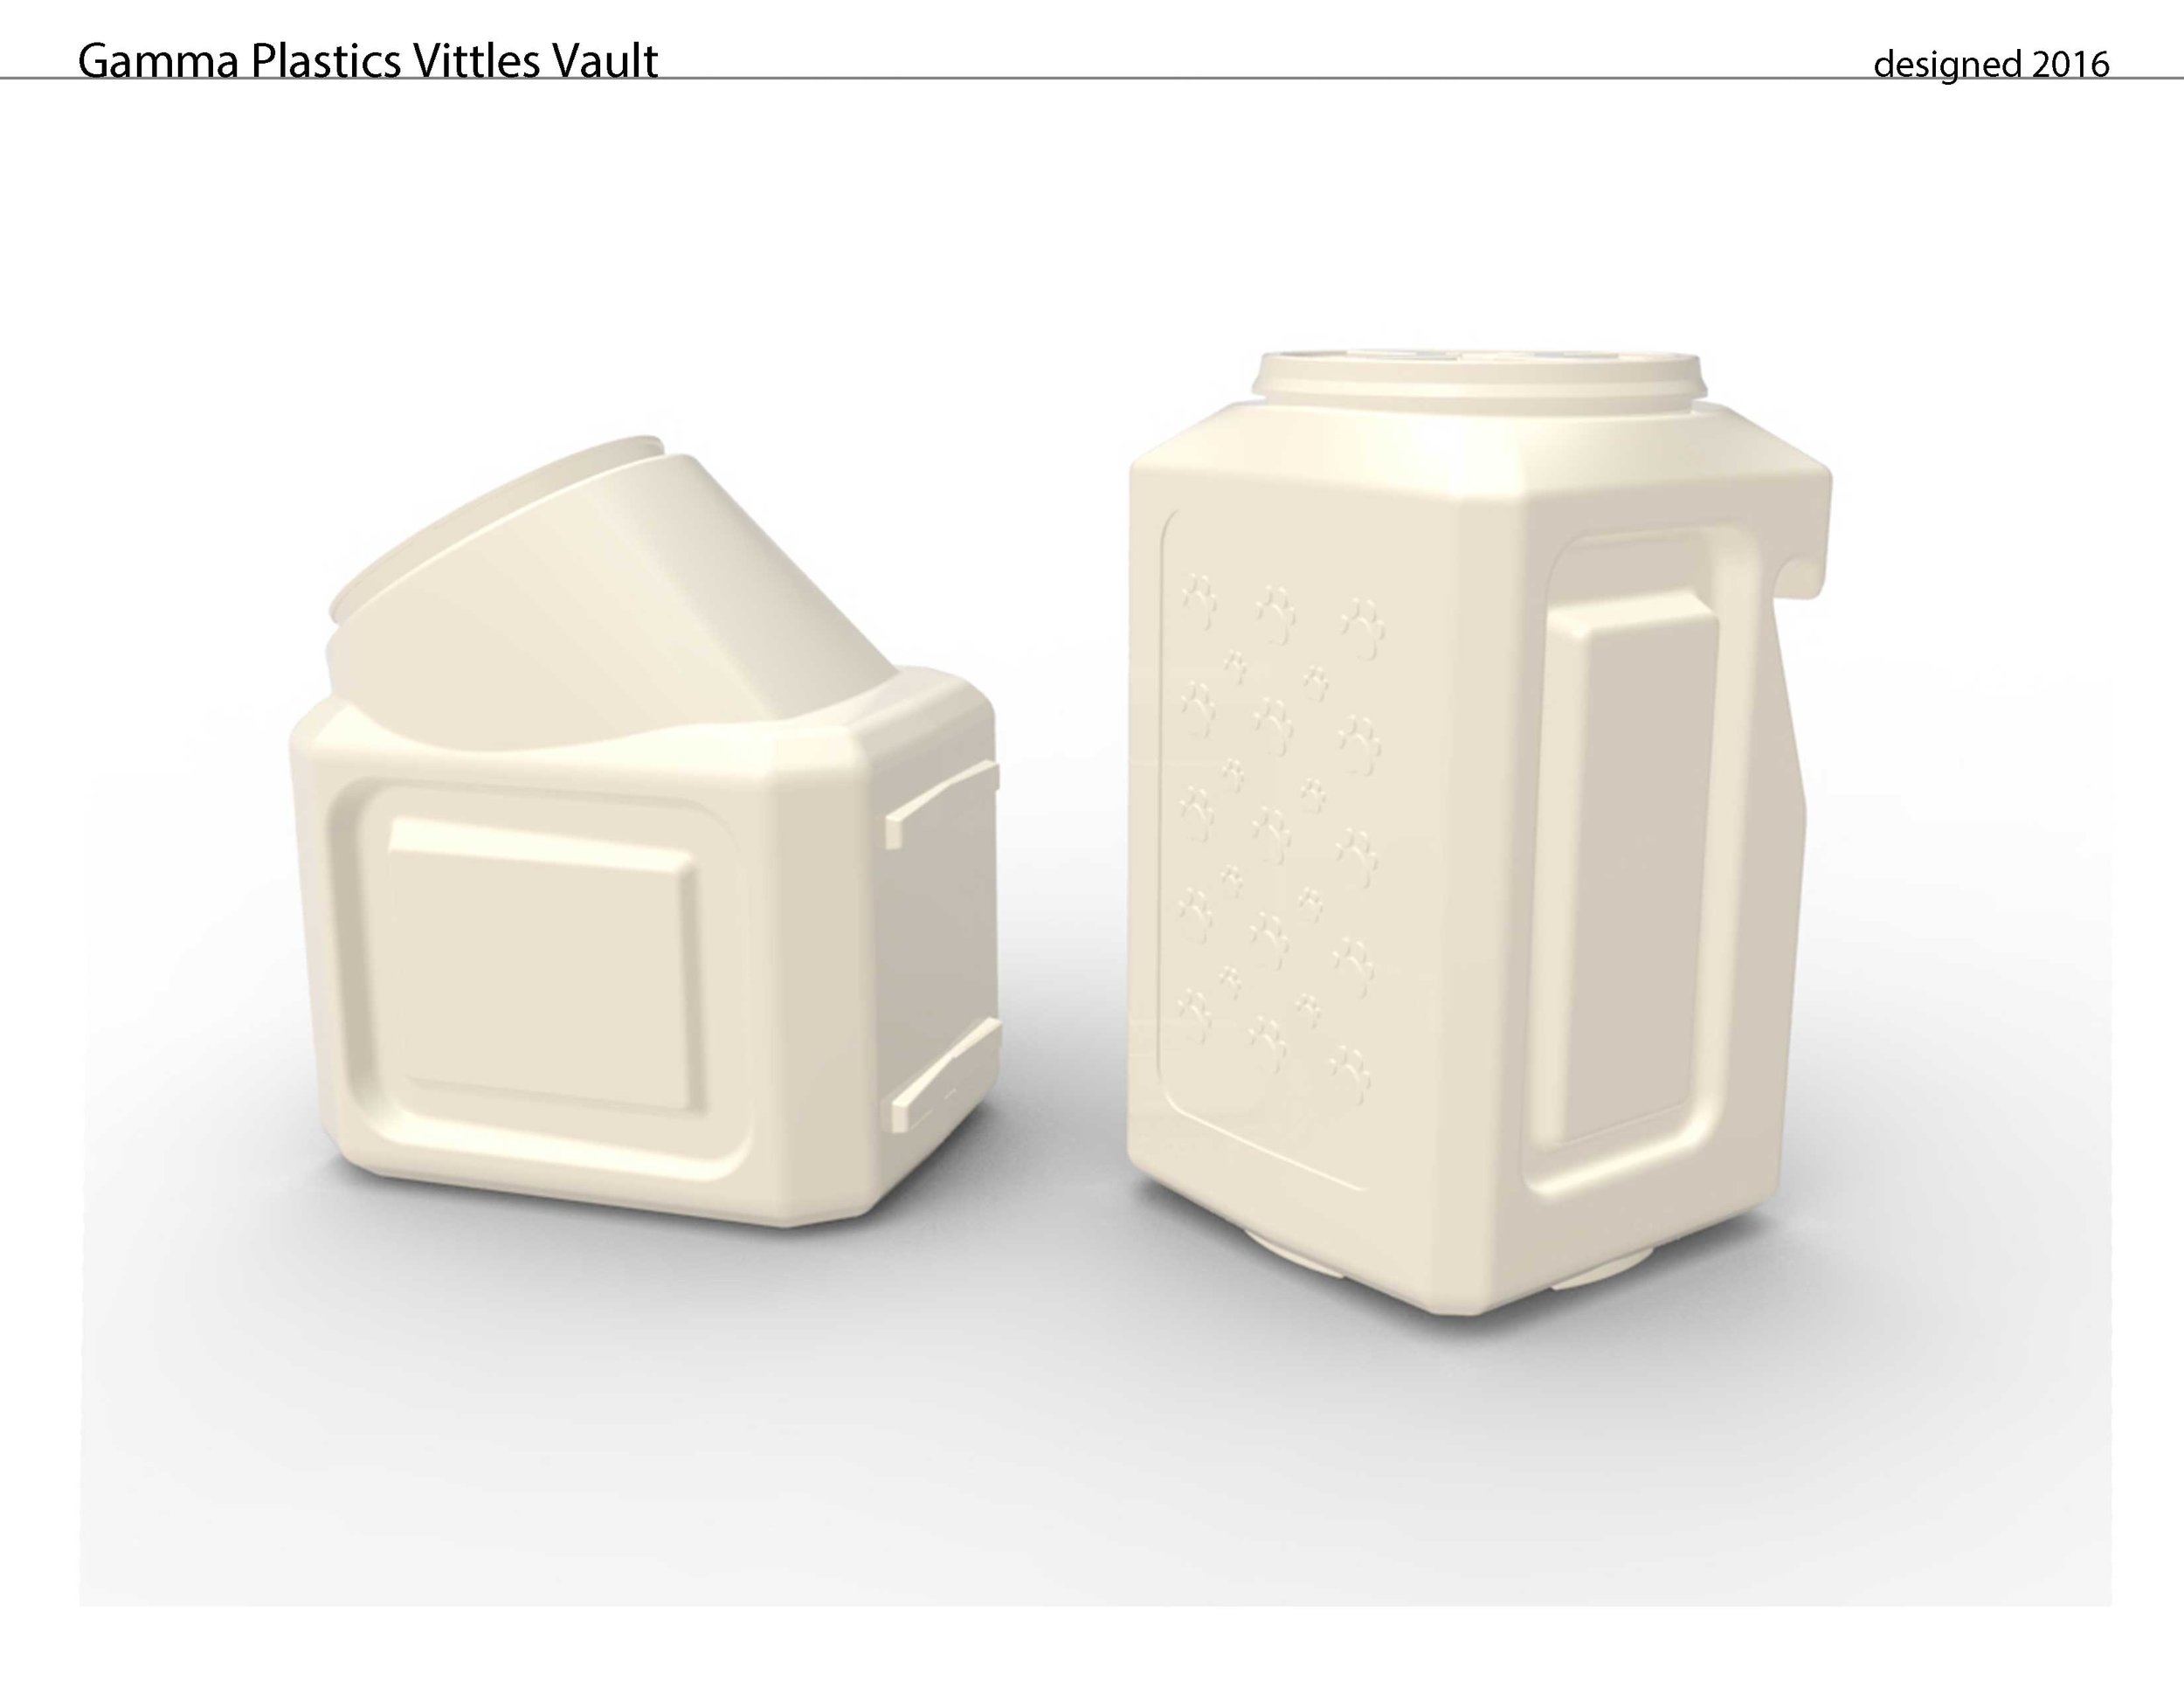 Gamma-Plastics-Vittles-Vault.jpg